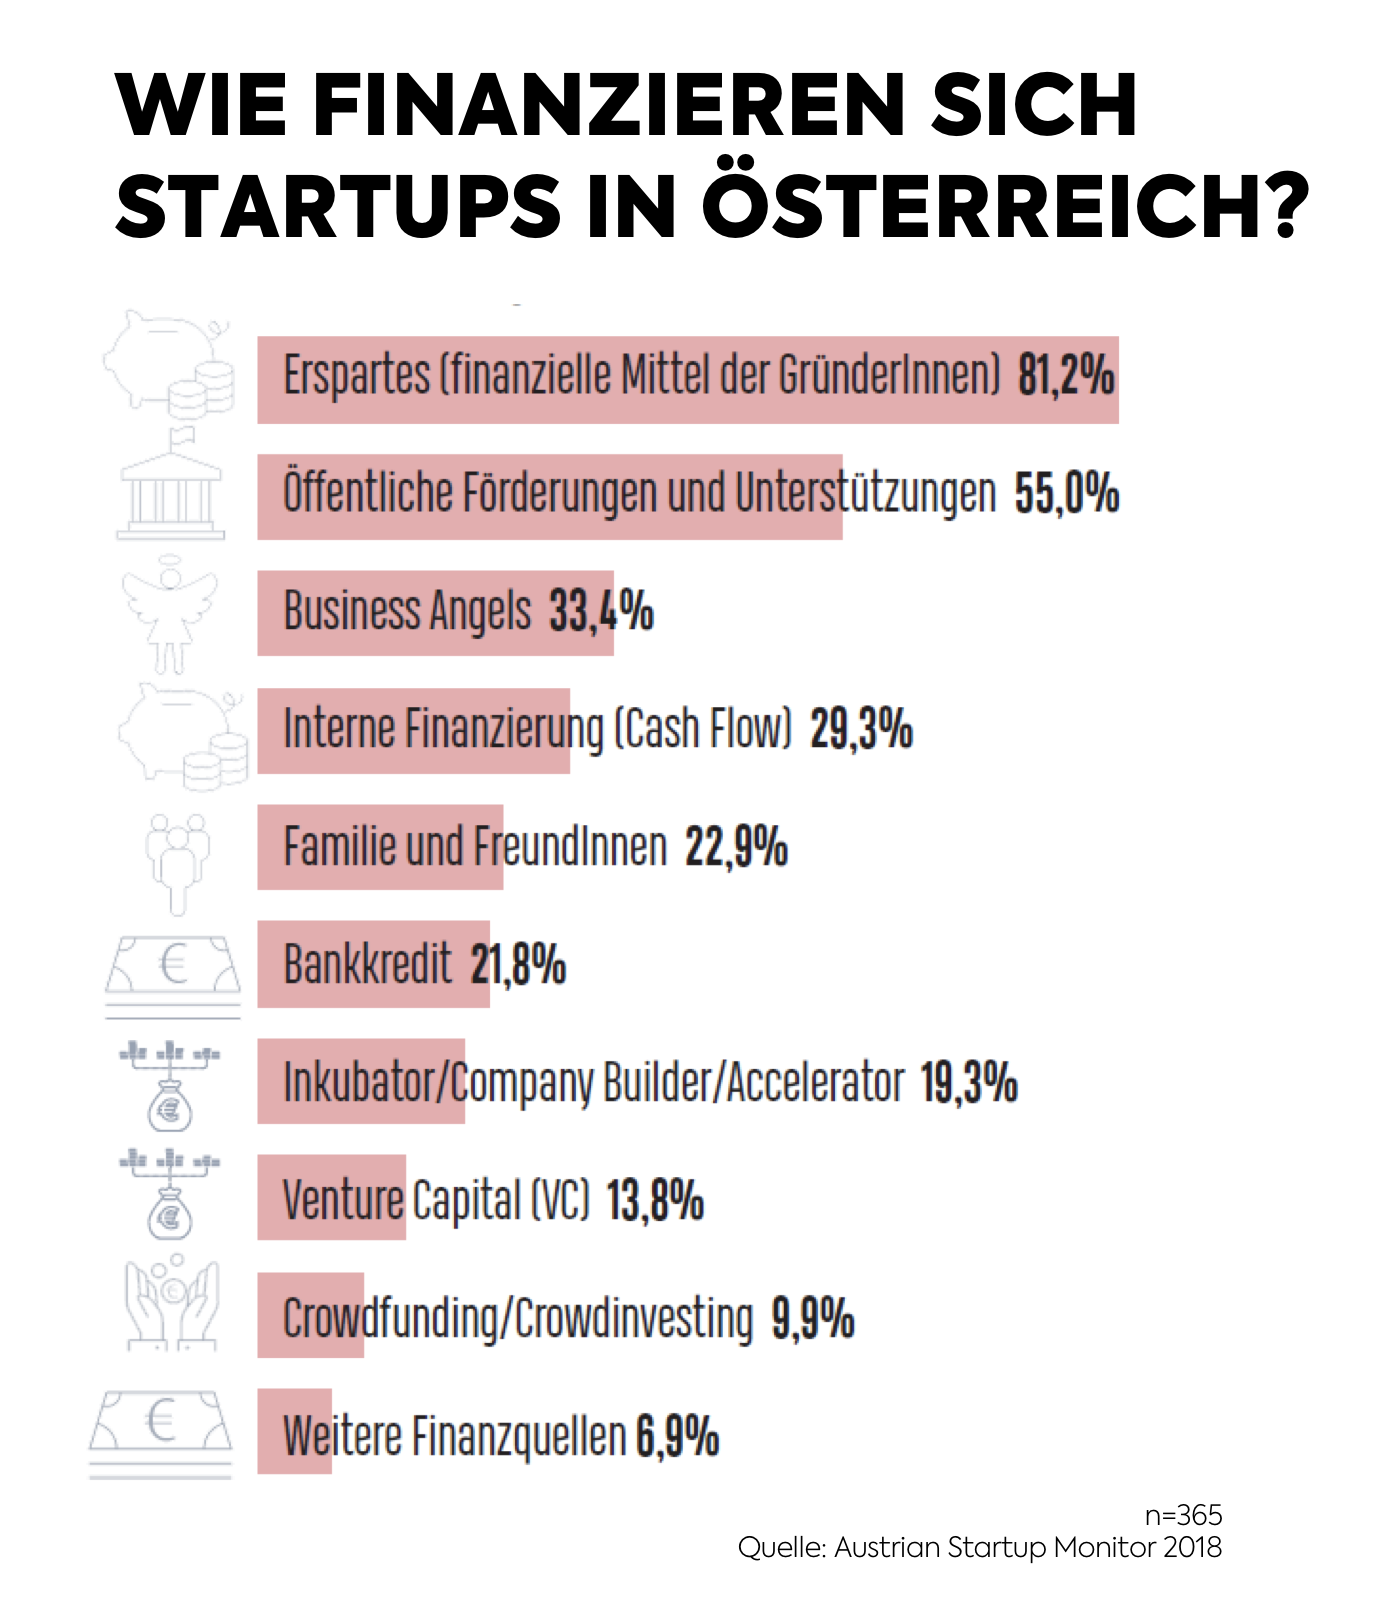 1. Austrian Startup Monitor - Finanzierung